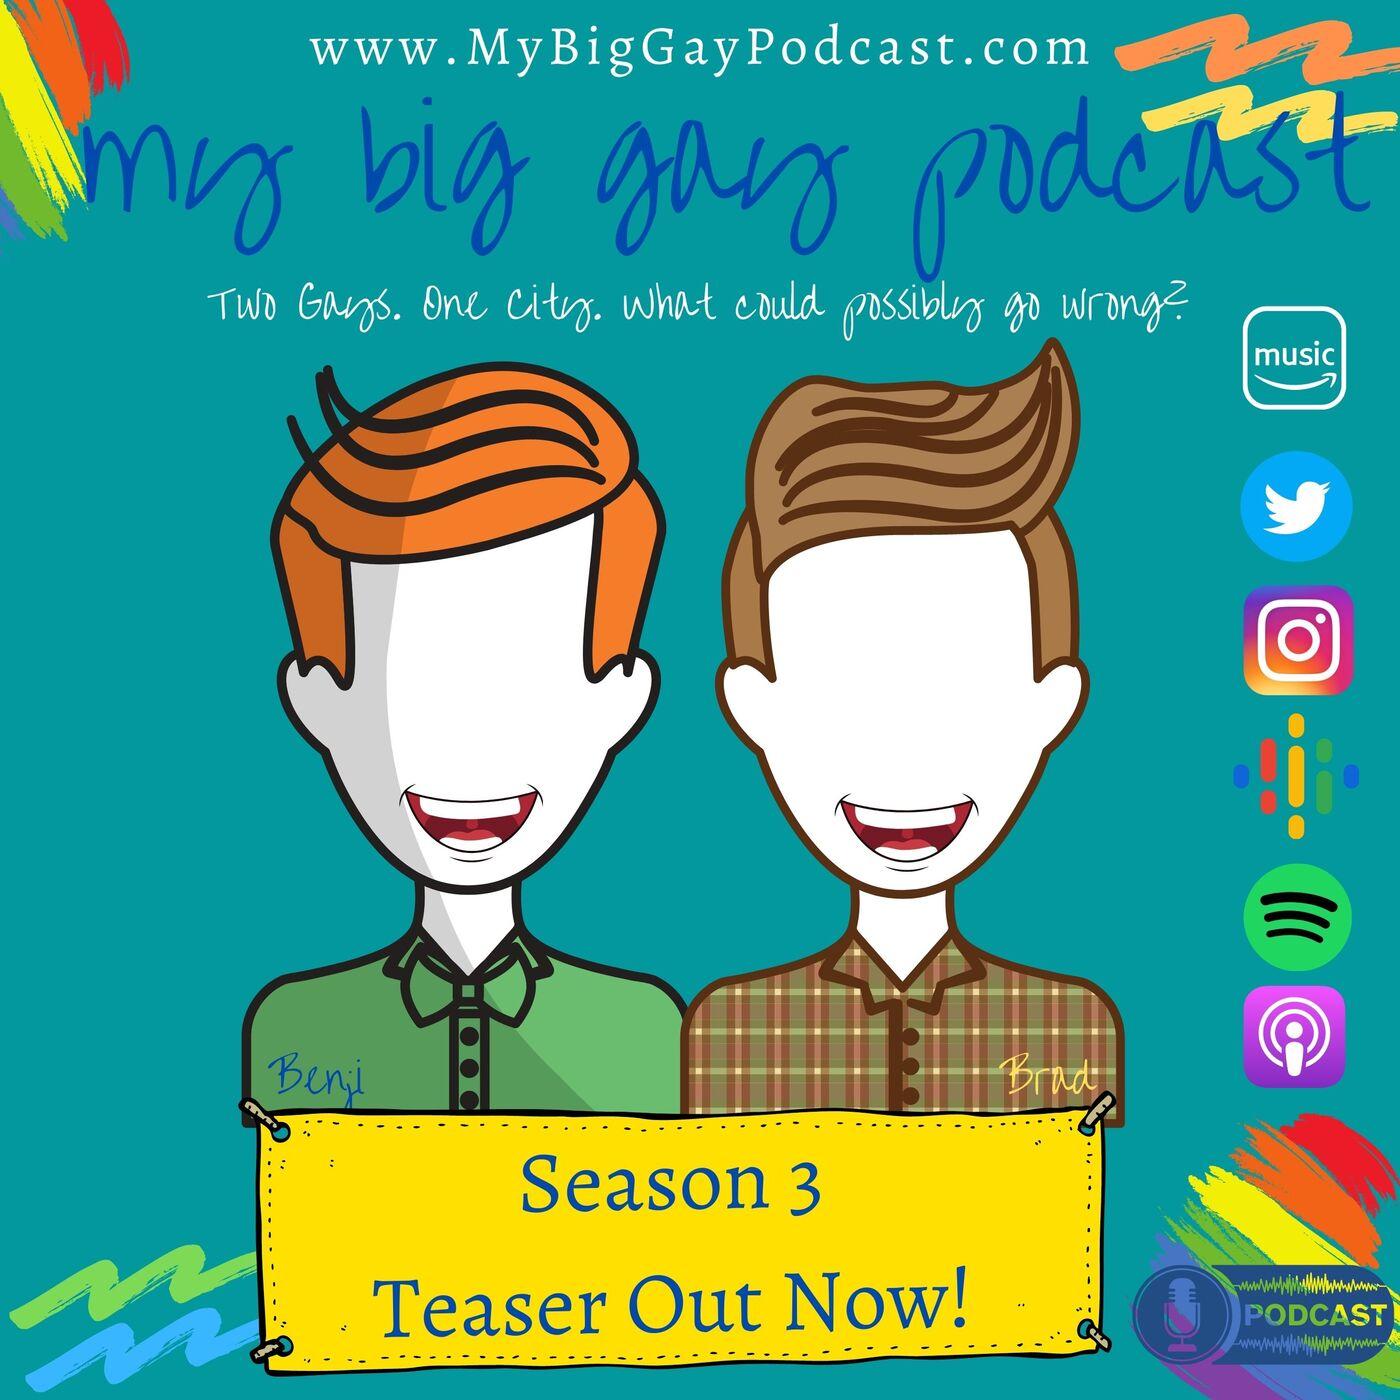 Season 3 - Teaser!